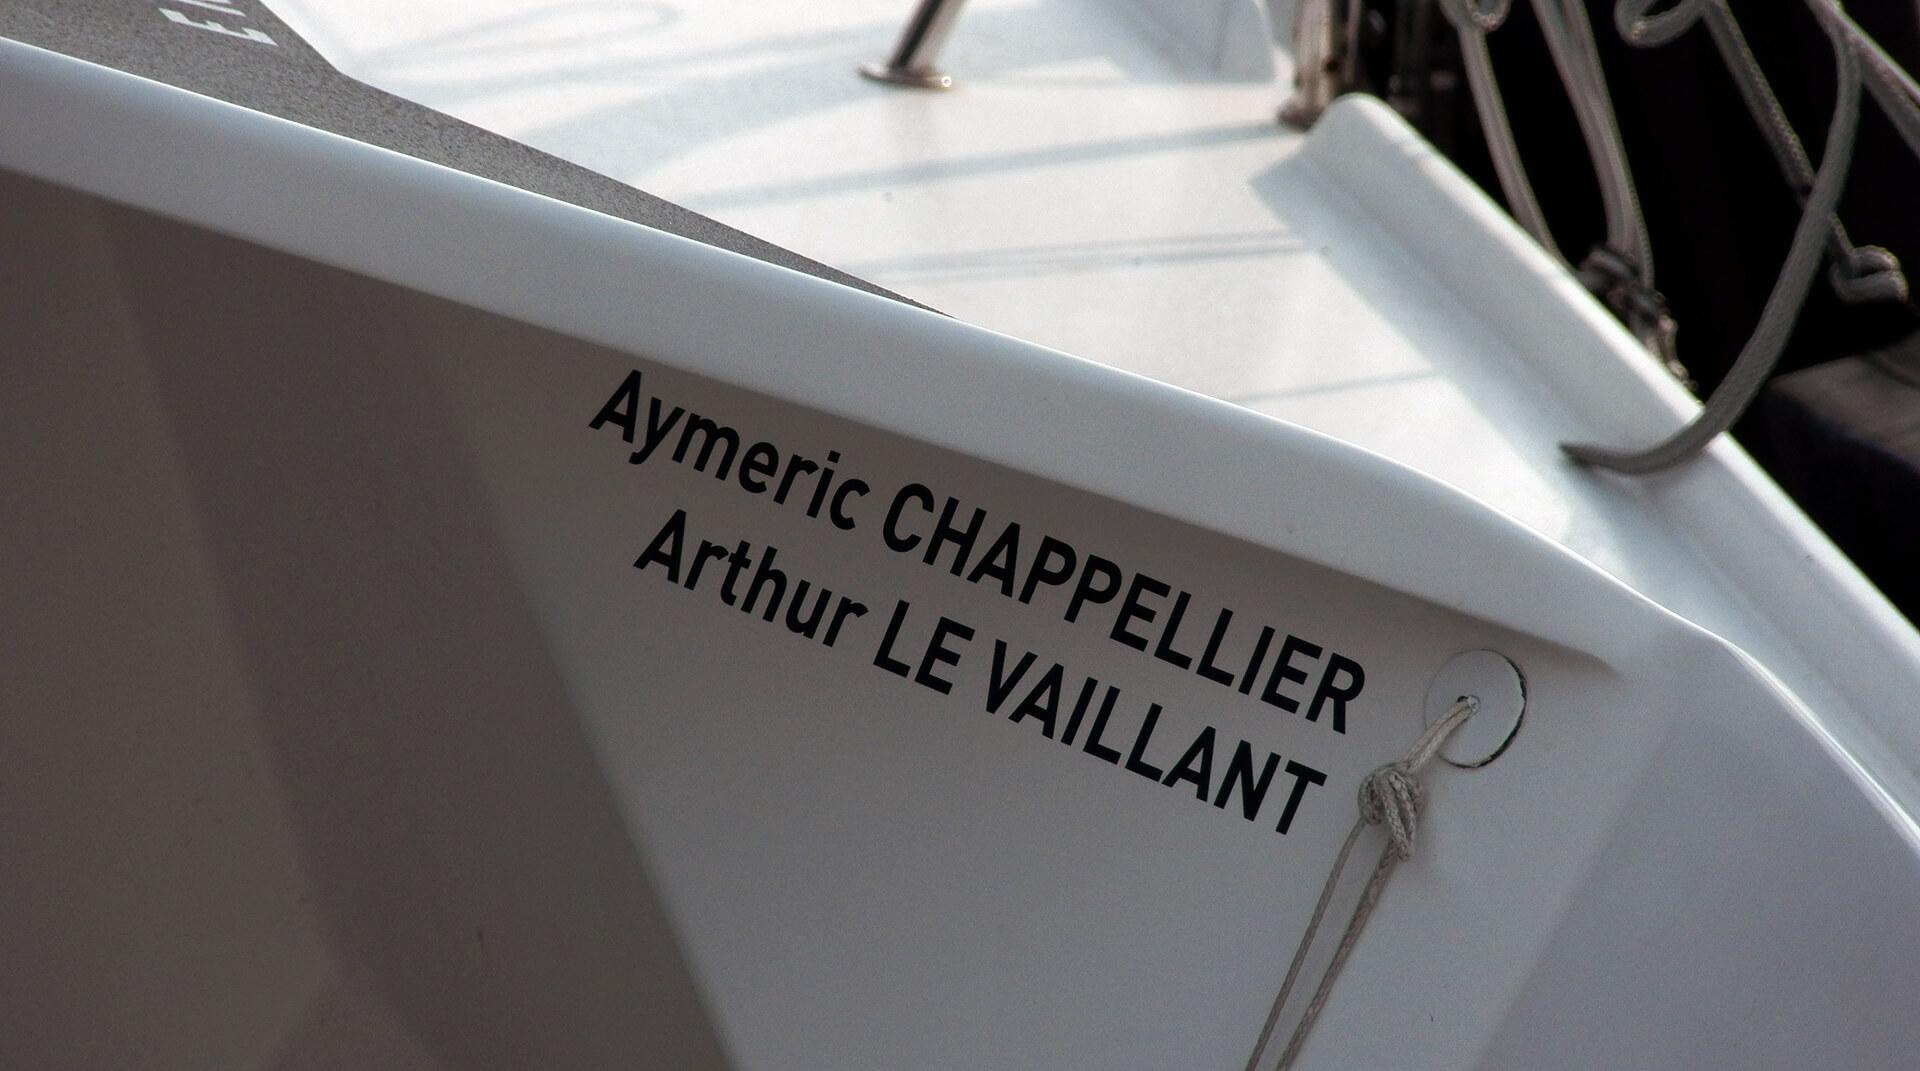 Transat-Jacques-Vabre-2017-Aymelric-Chappellier-AINA-6